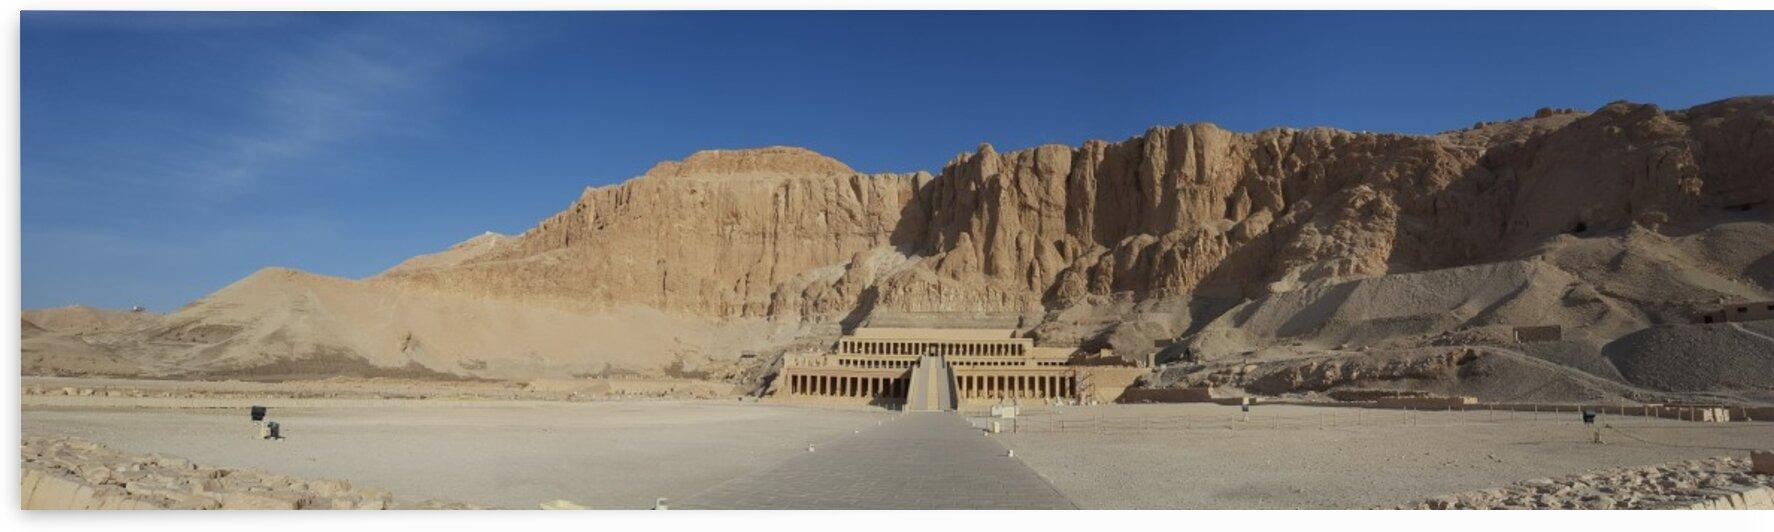 Egypt - Hatshepsut Temple by Sara Mikhail